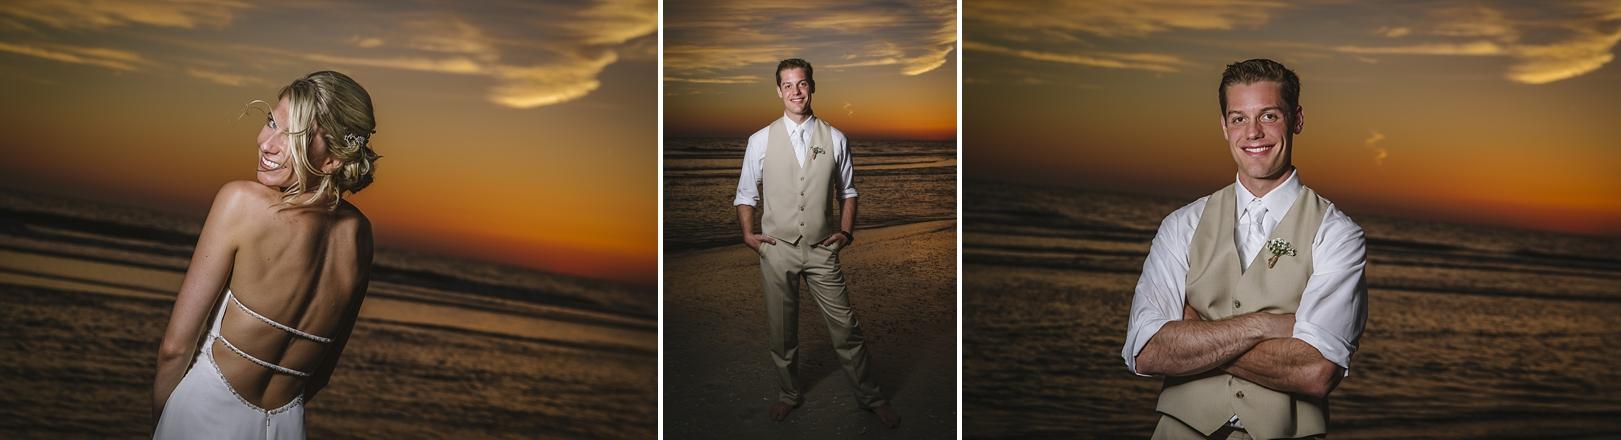 sunset sirata beach wedding photos